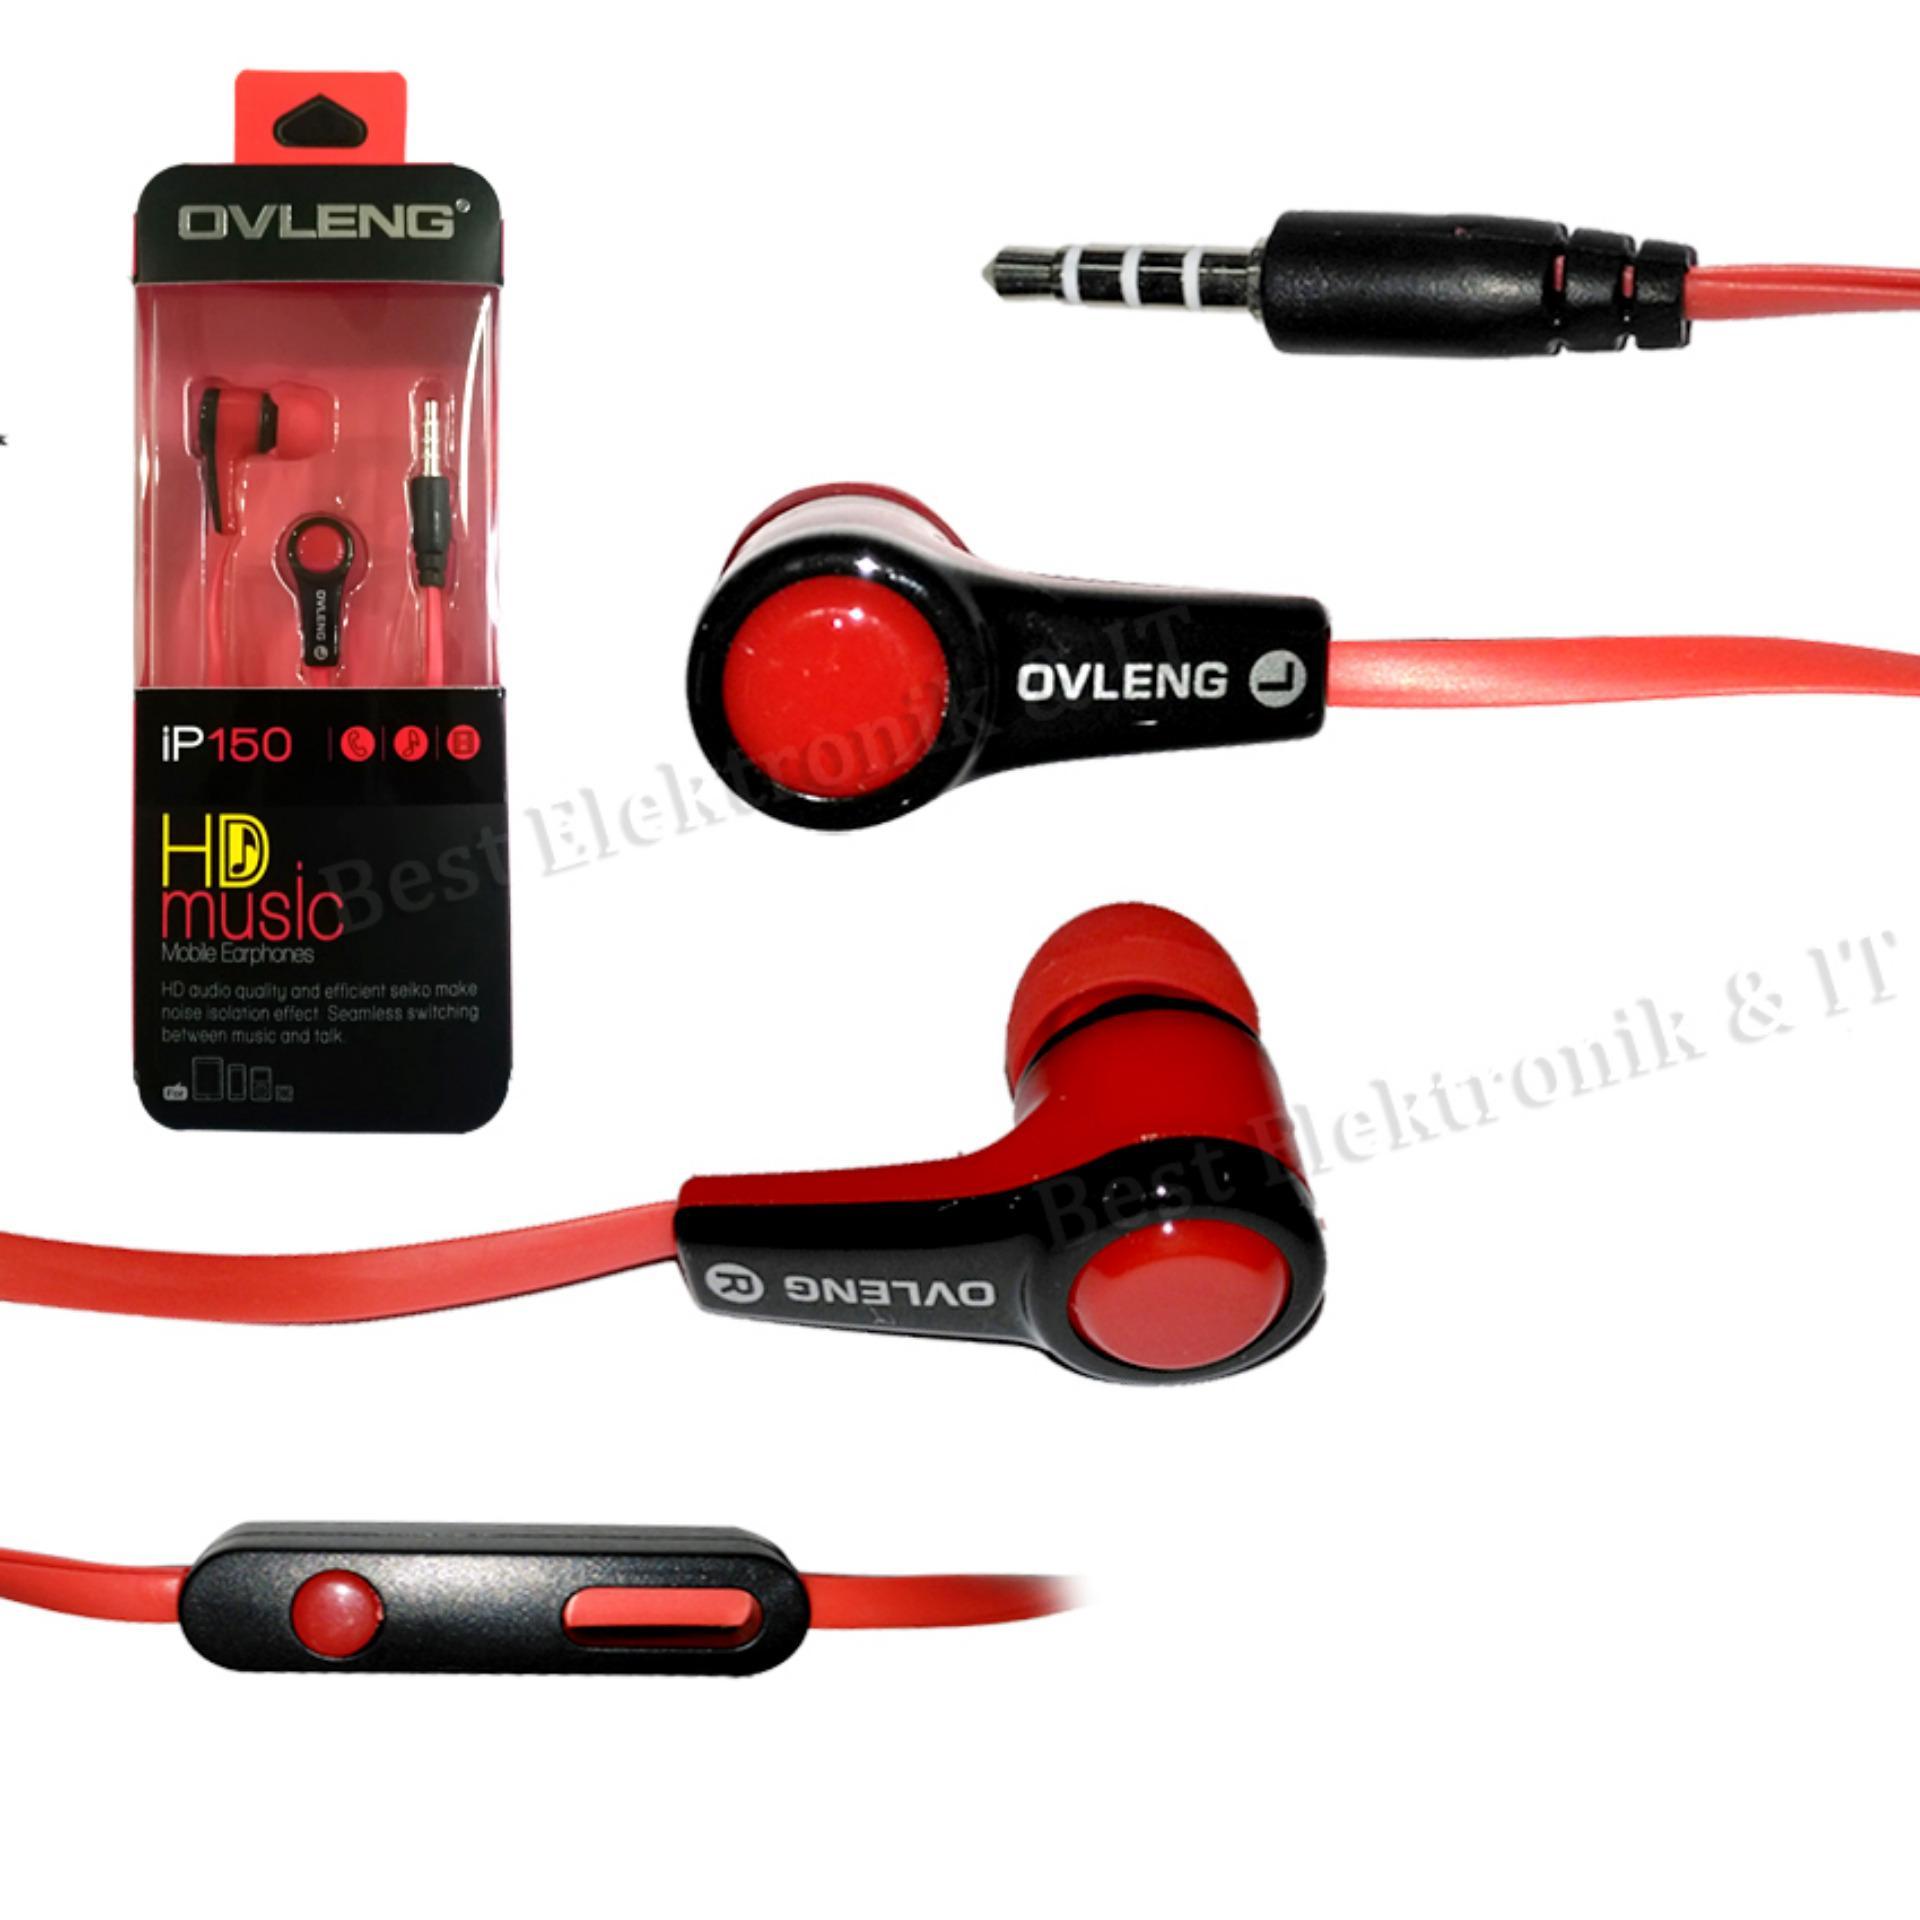 Ovleng Headset Stereo L809 Hitam Spec Dan Daftar Harga Terbaru Headphone Ov X11 With Mic Merah Ip150 In Ear Mobile Earphone